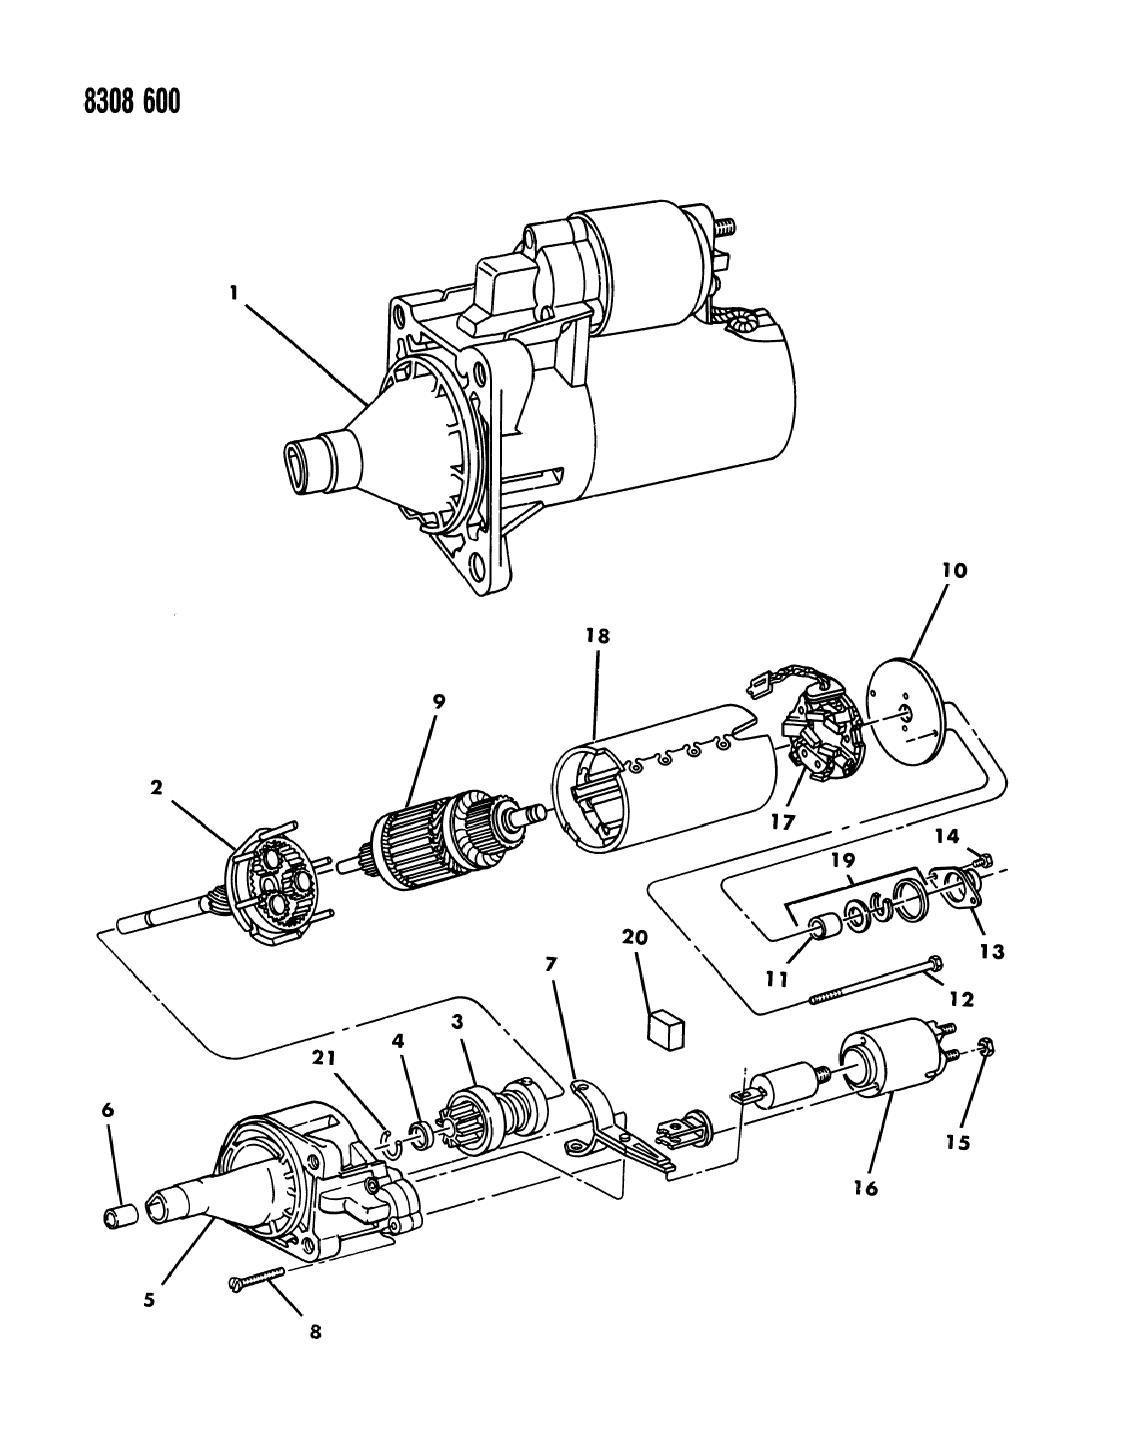 1988 Dodge Dakota Wiring - Diagrams Catalogue